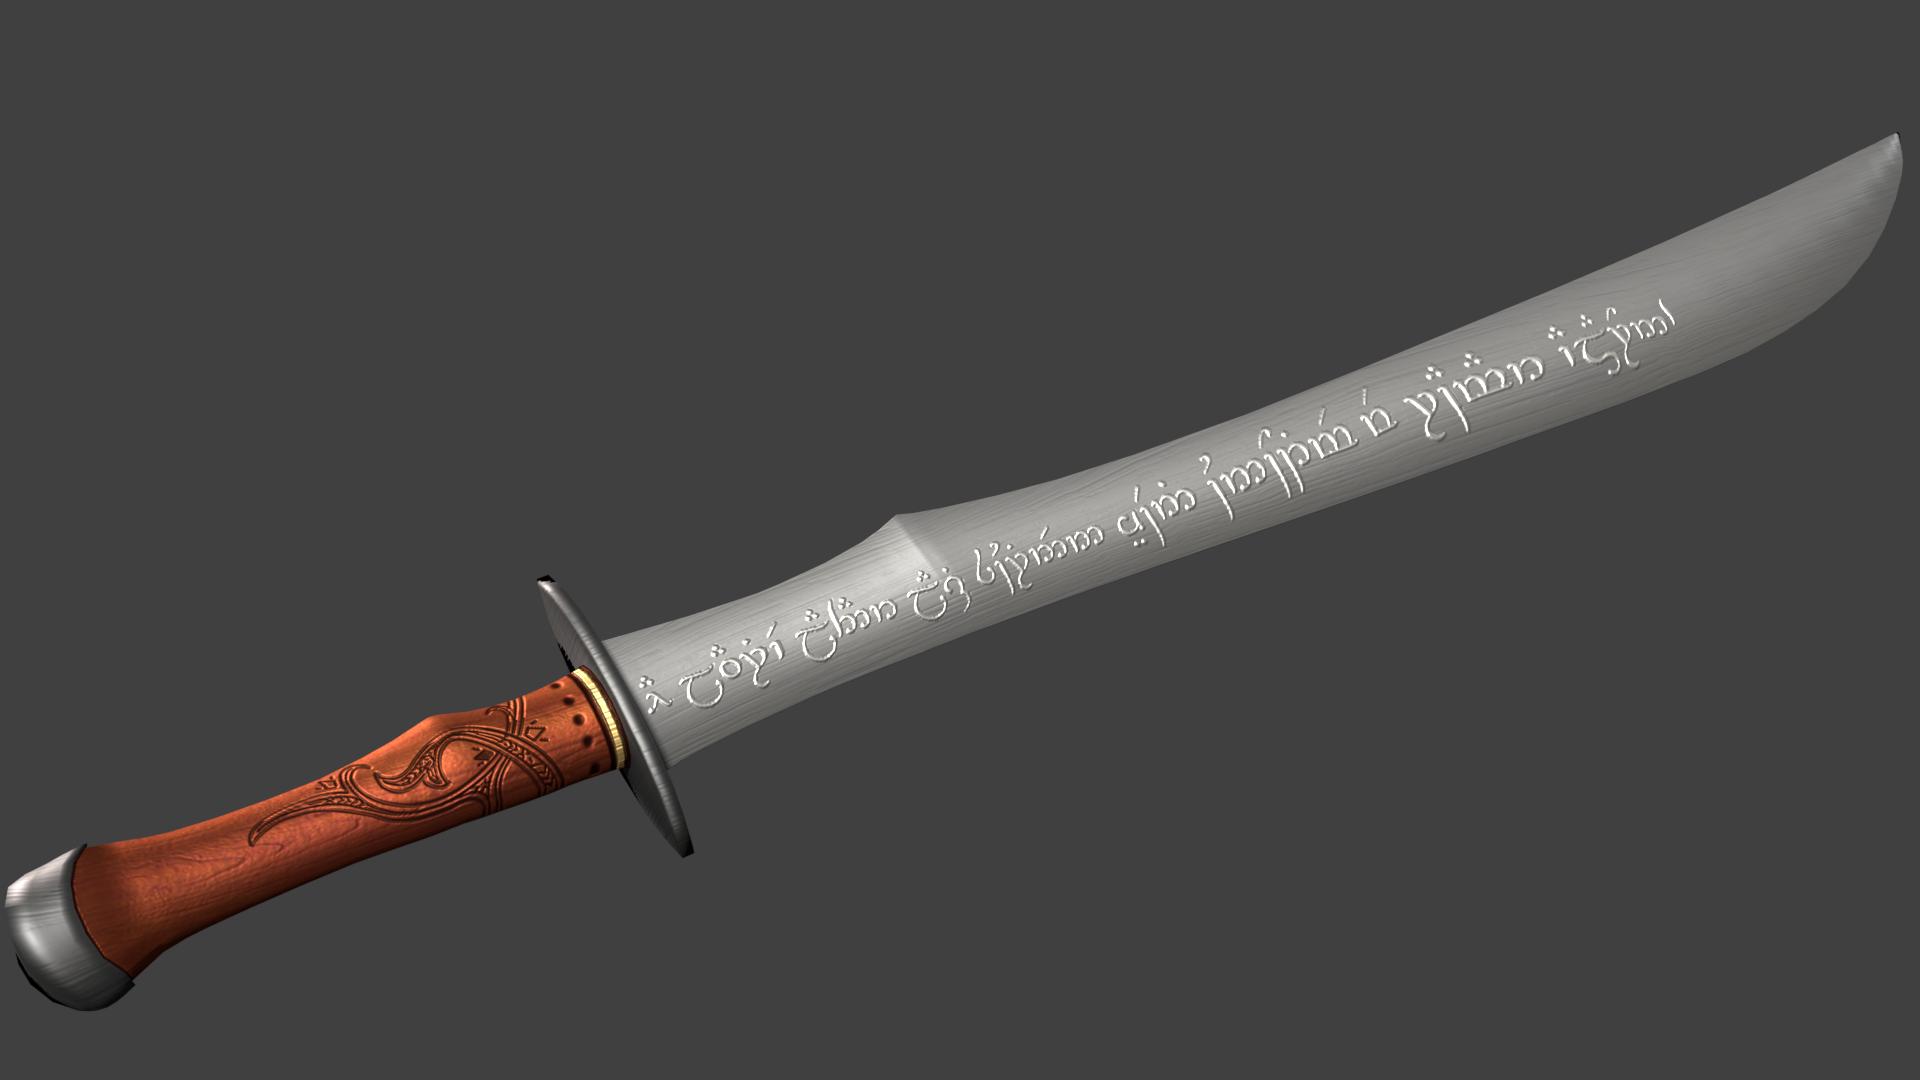 Thorondun, Sword of Glorfindel